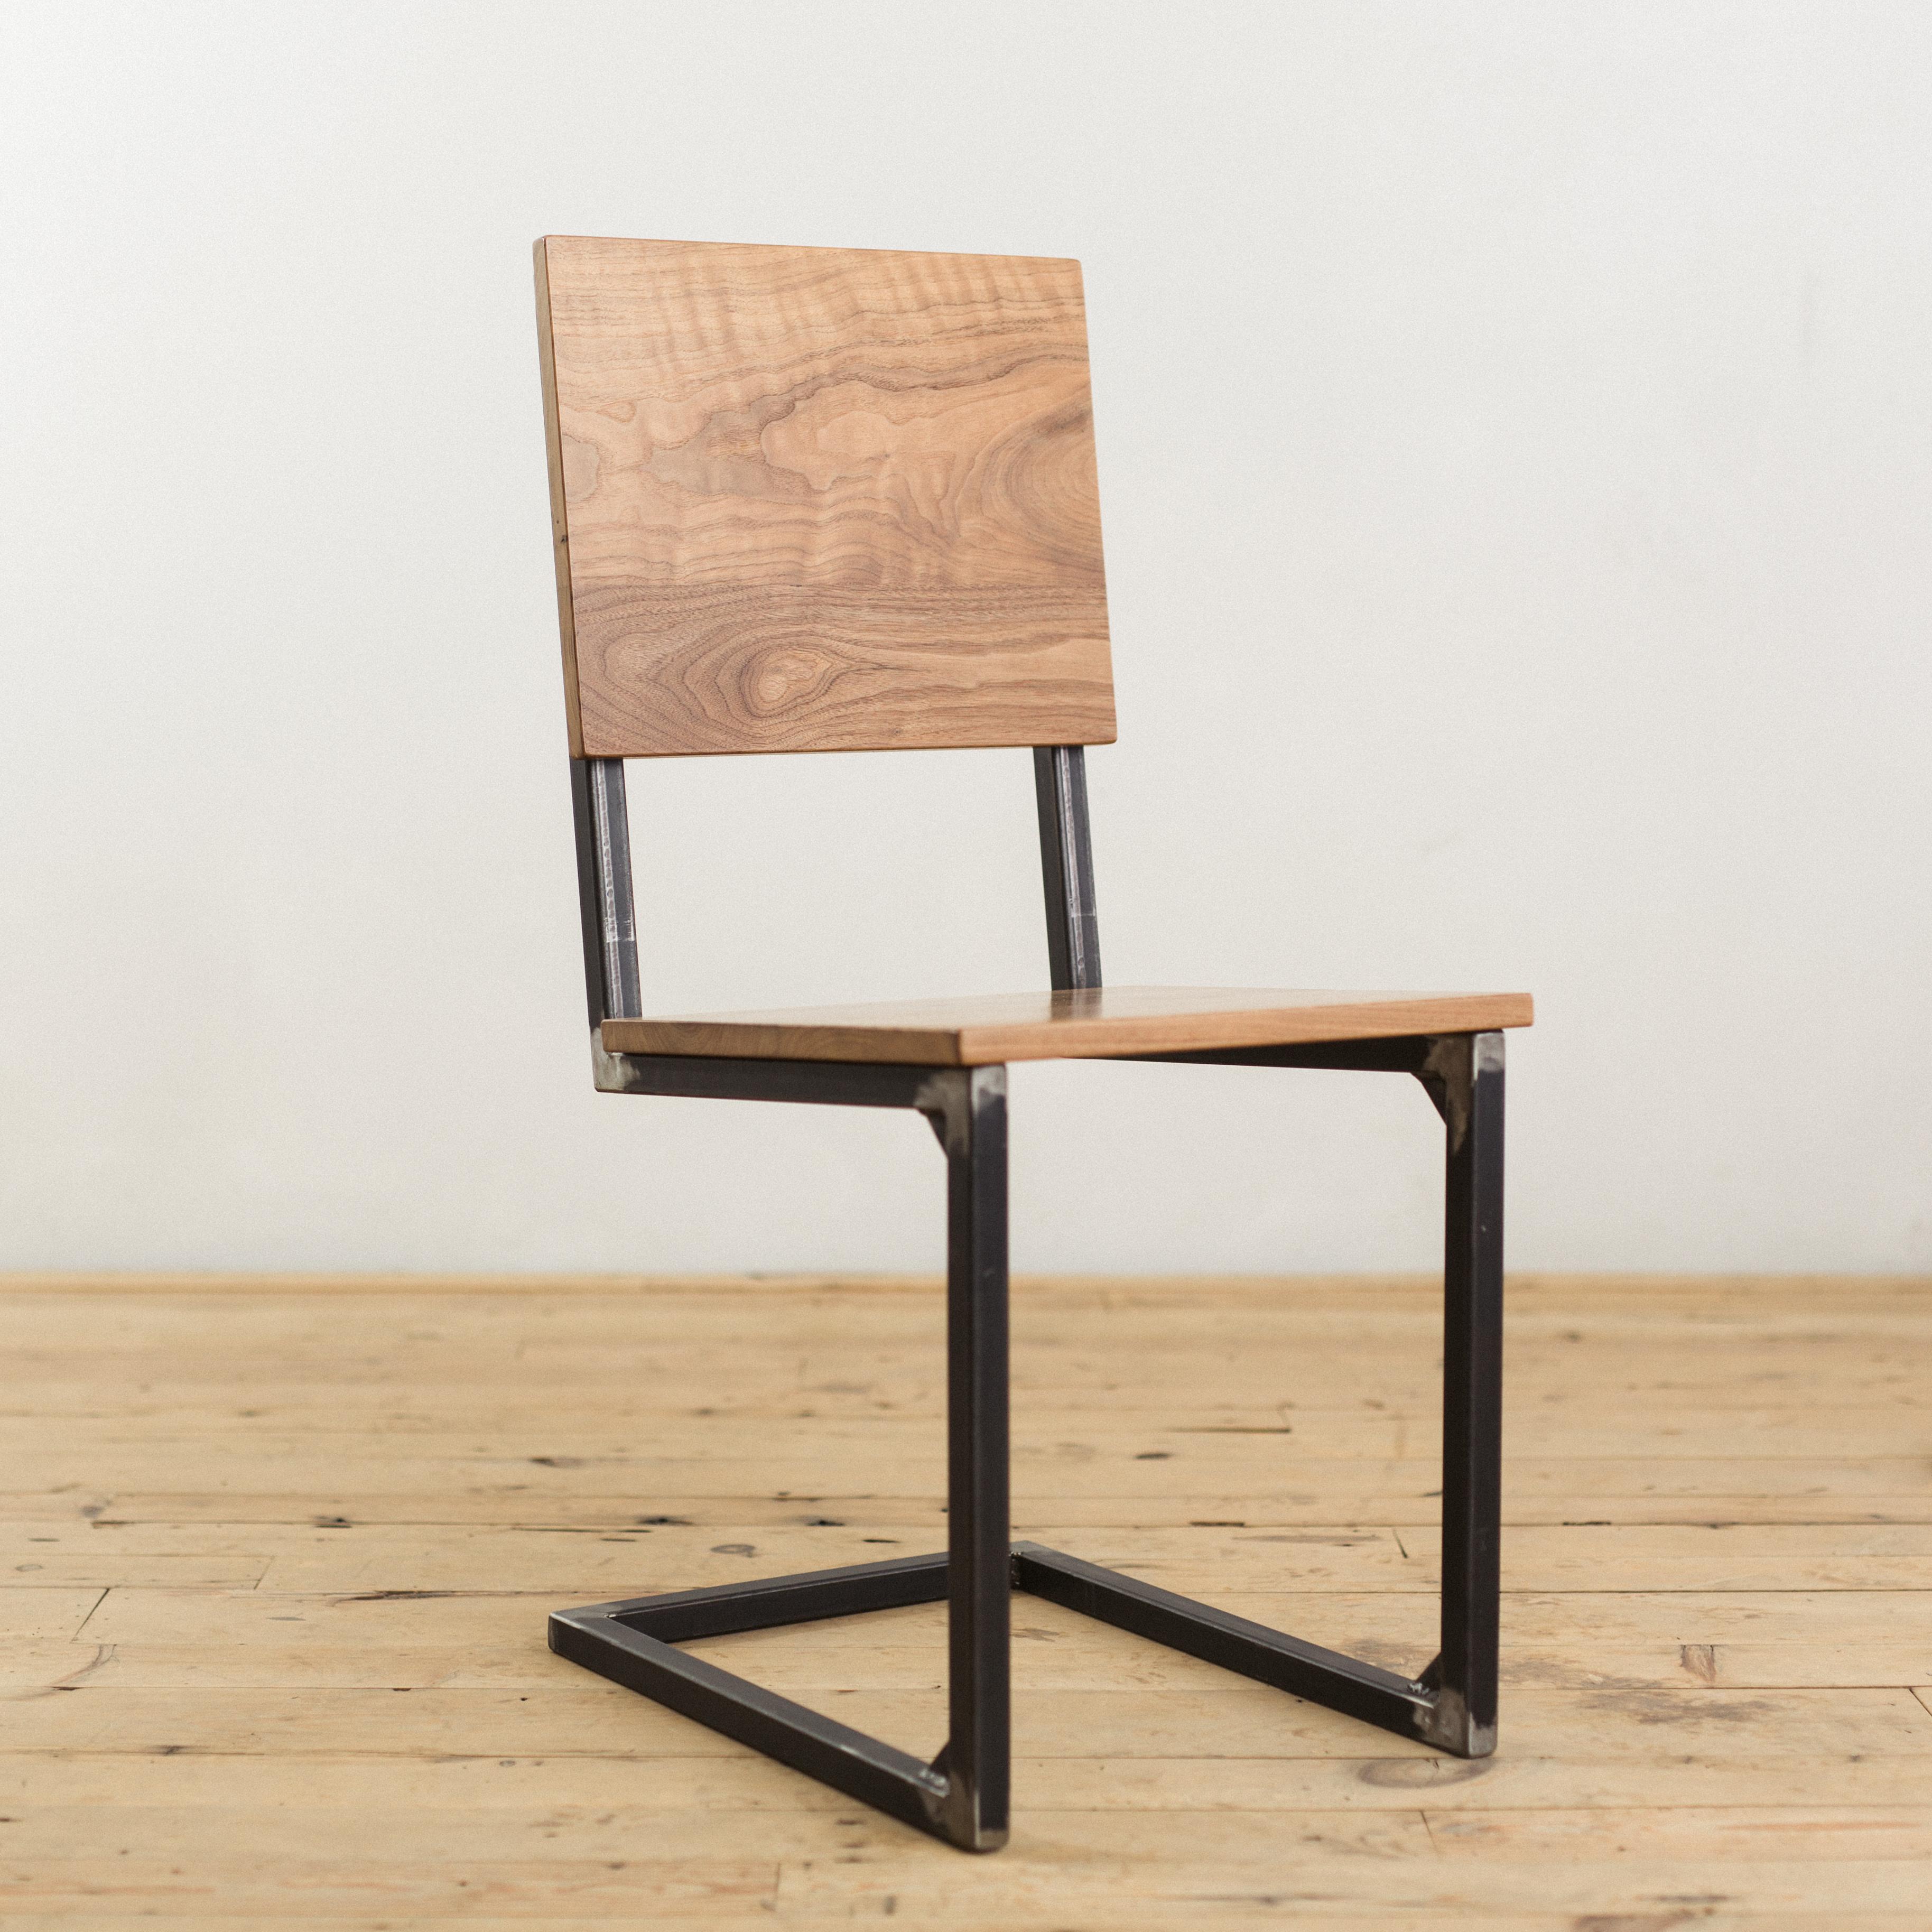 Fabricated Steel Coffee Table: Walnut And Steel School/House Chair